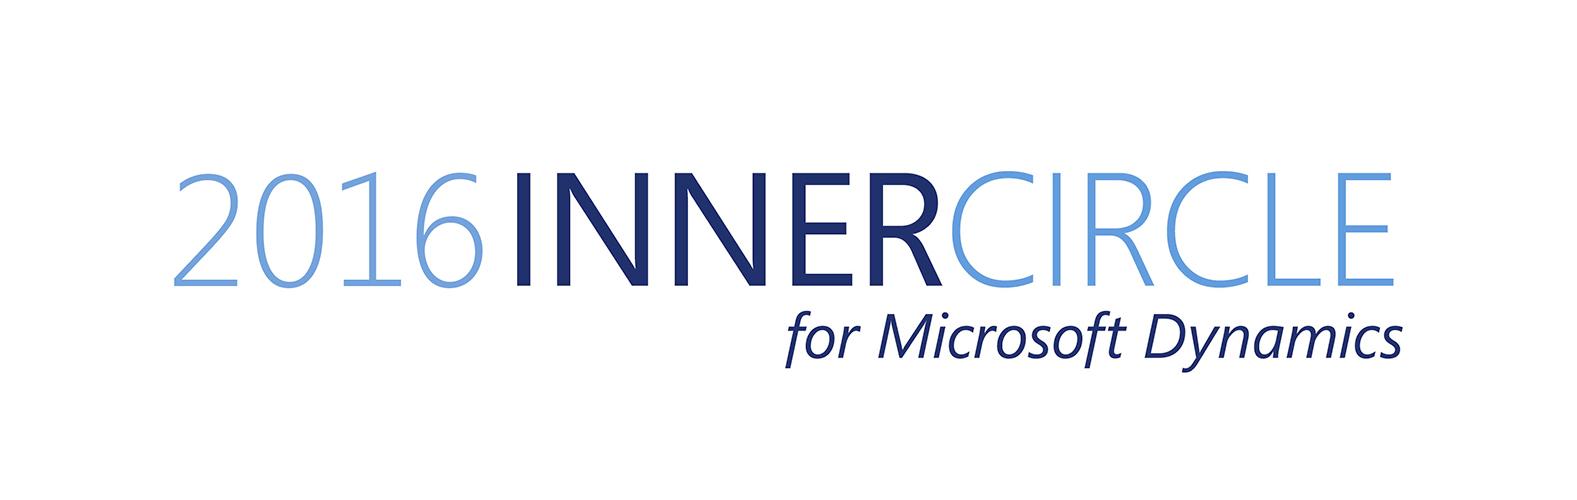 2016 innercircle for Microsoft Dynamics